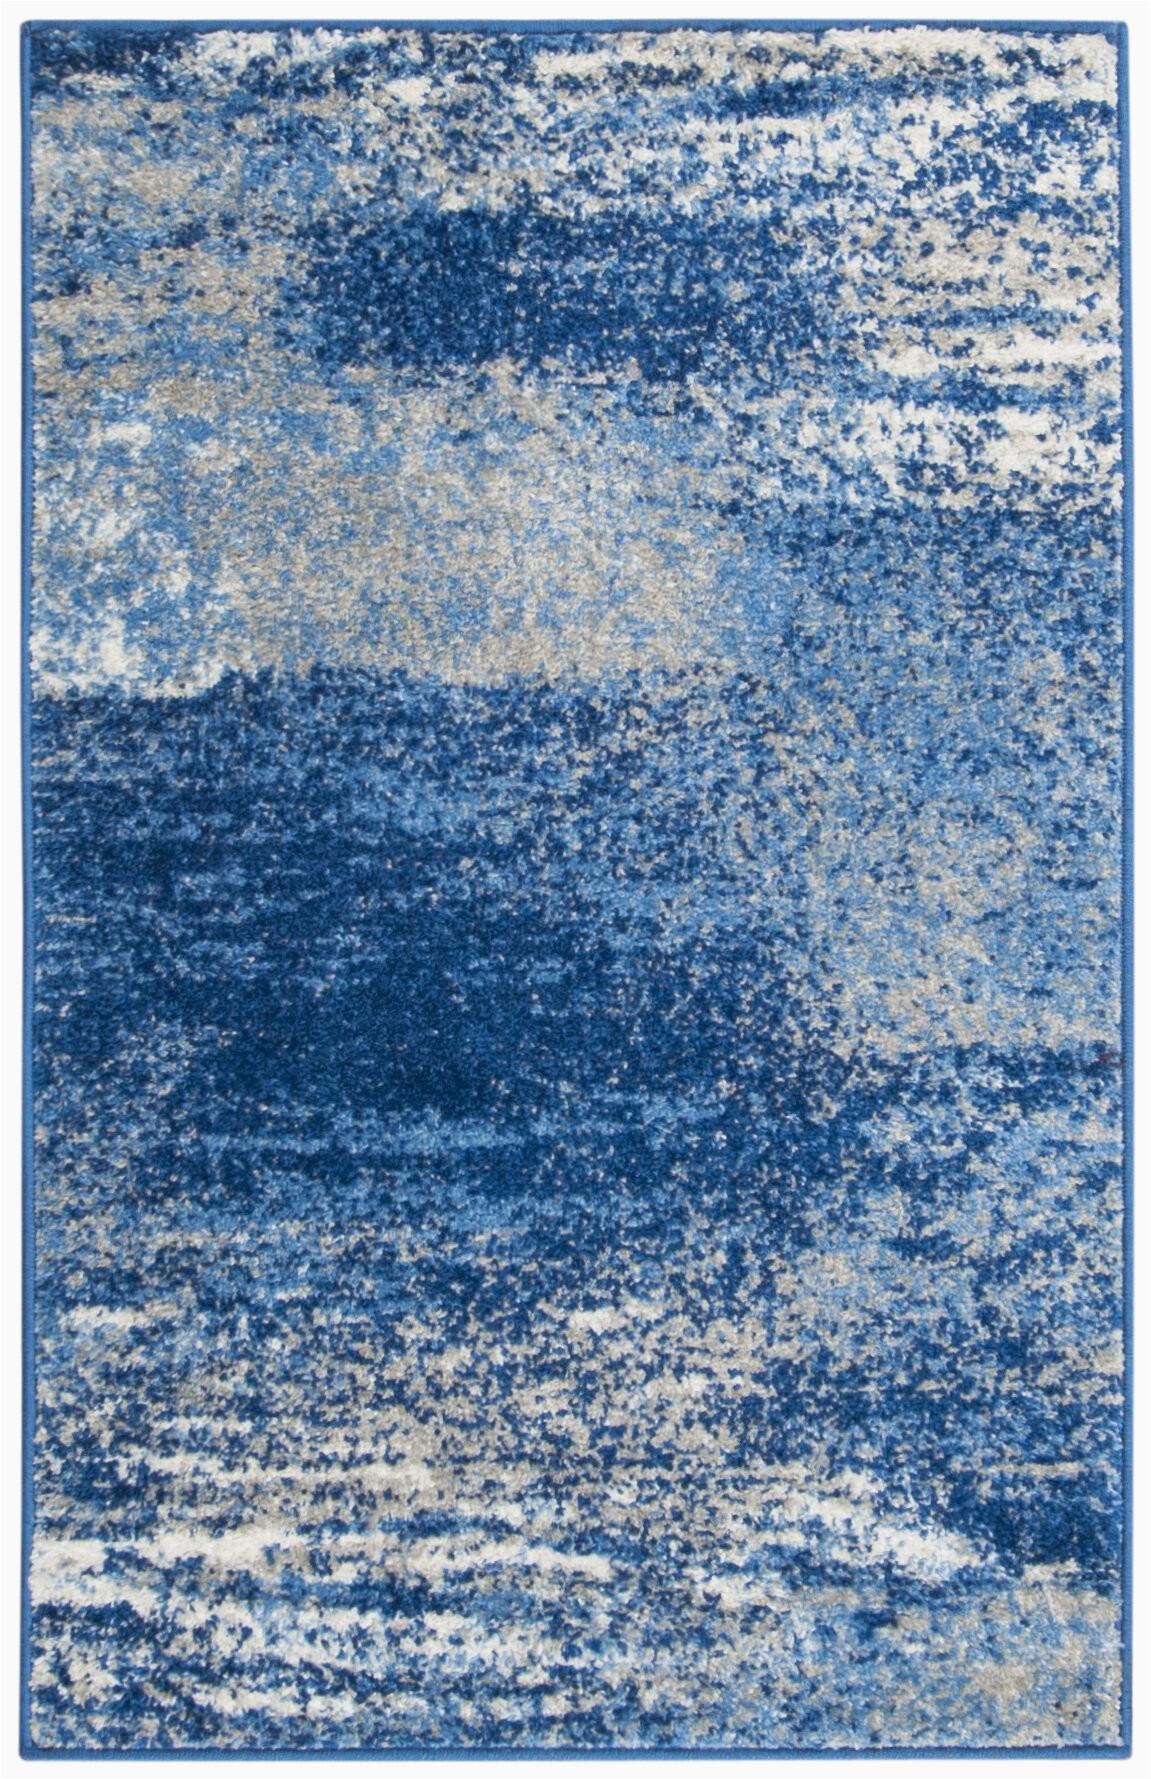 costa mesa silverblue area rug trnt1517 piid=